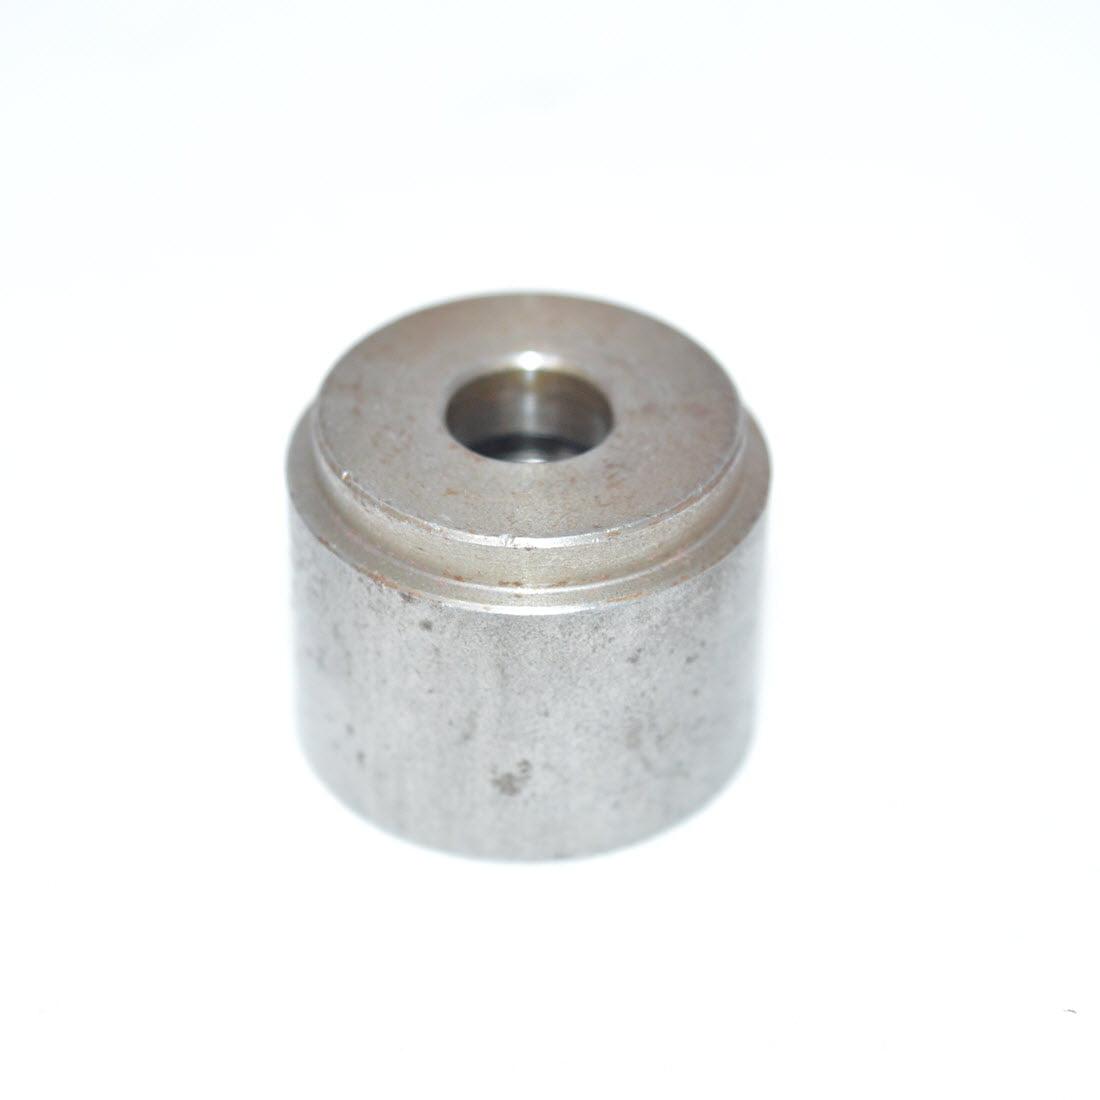 Exhaust Temperature Sensor Adapter M16 x 1.5